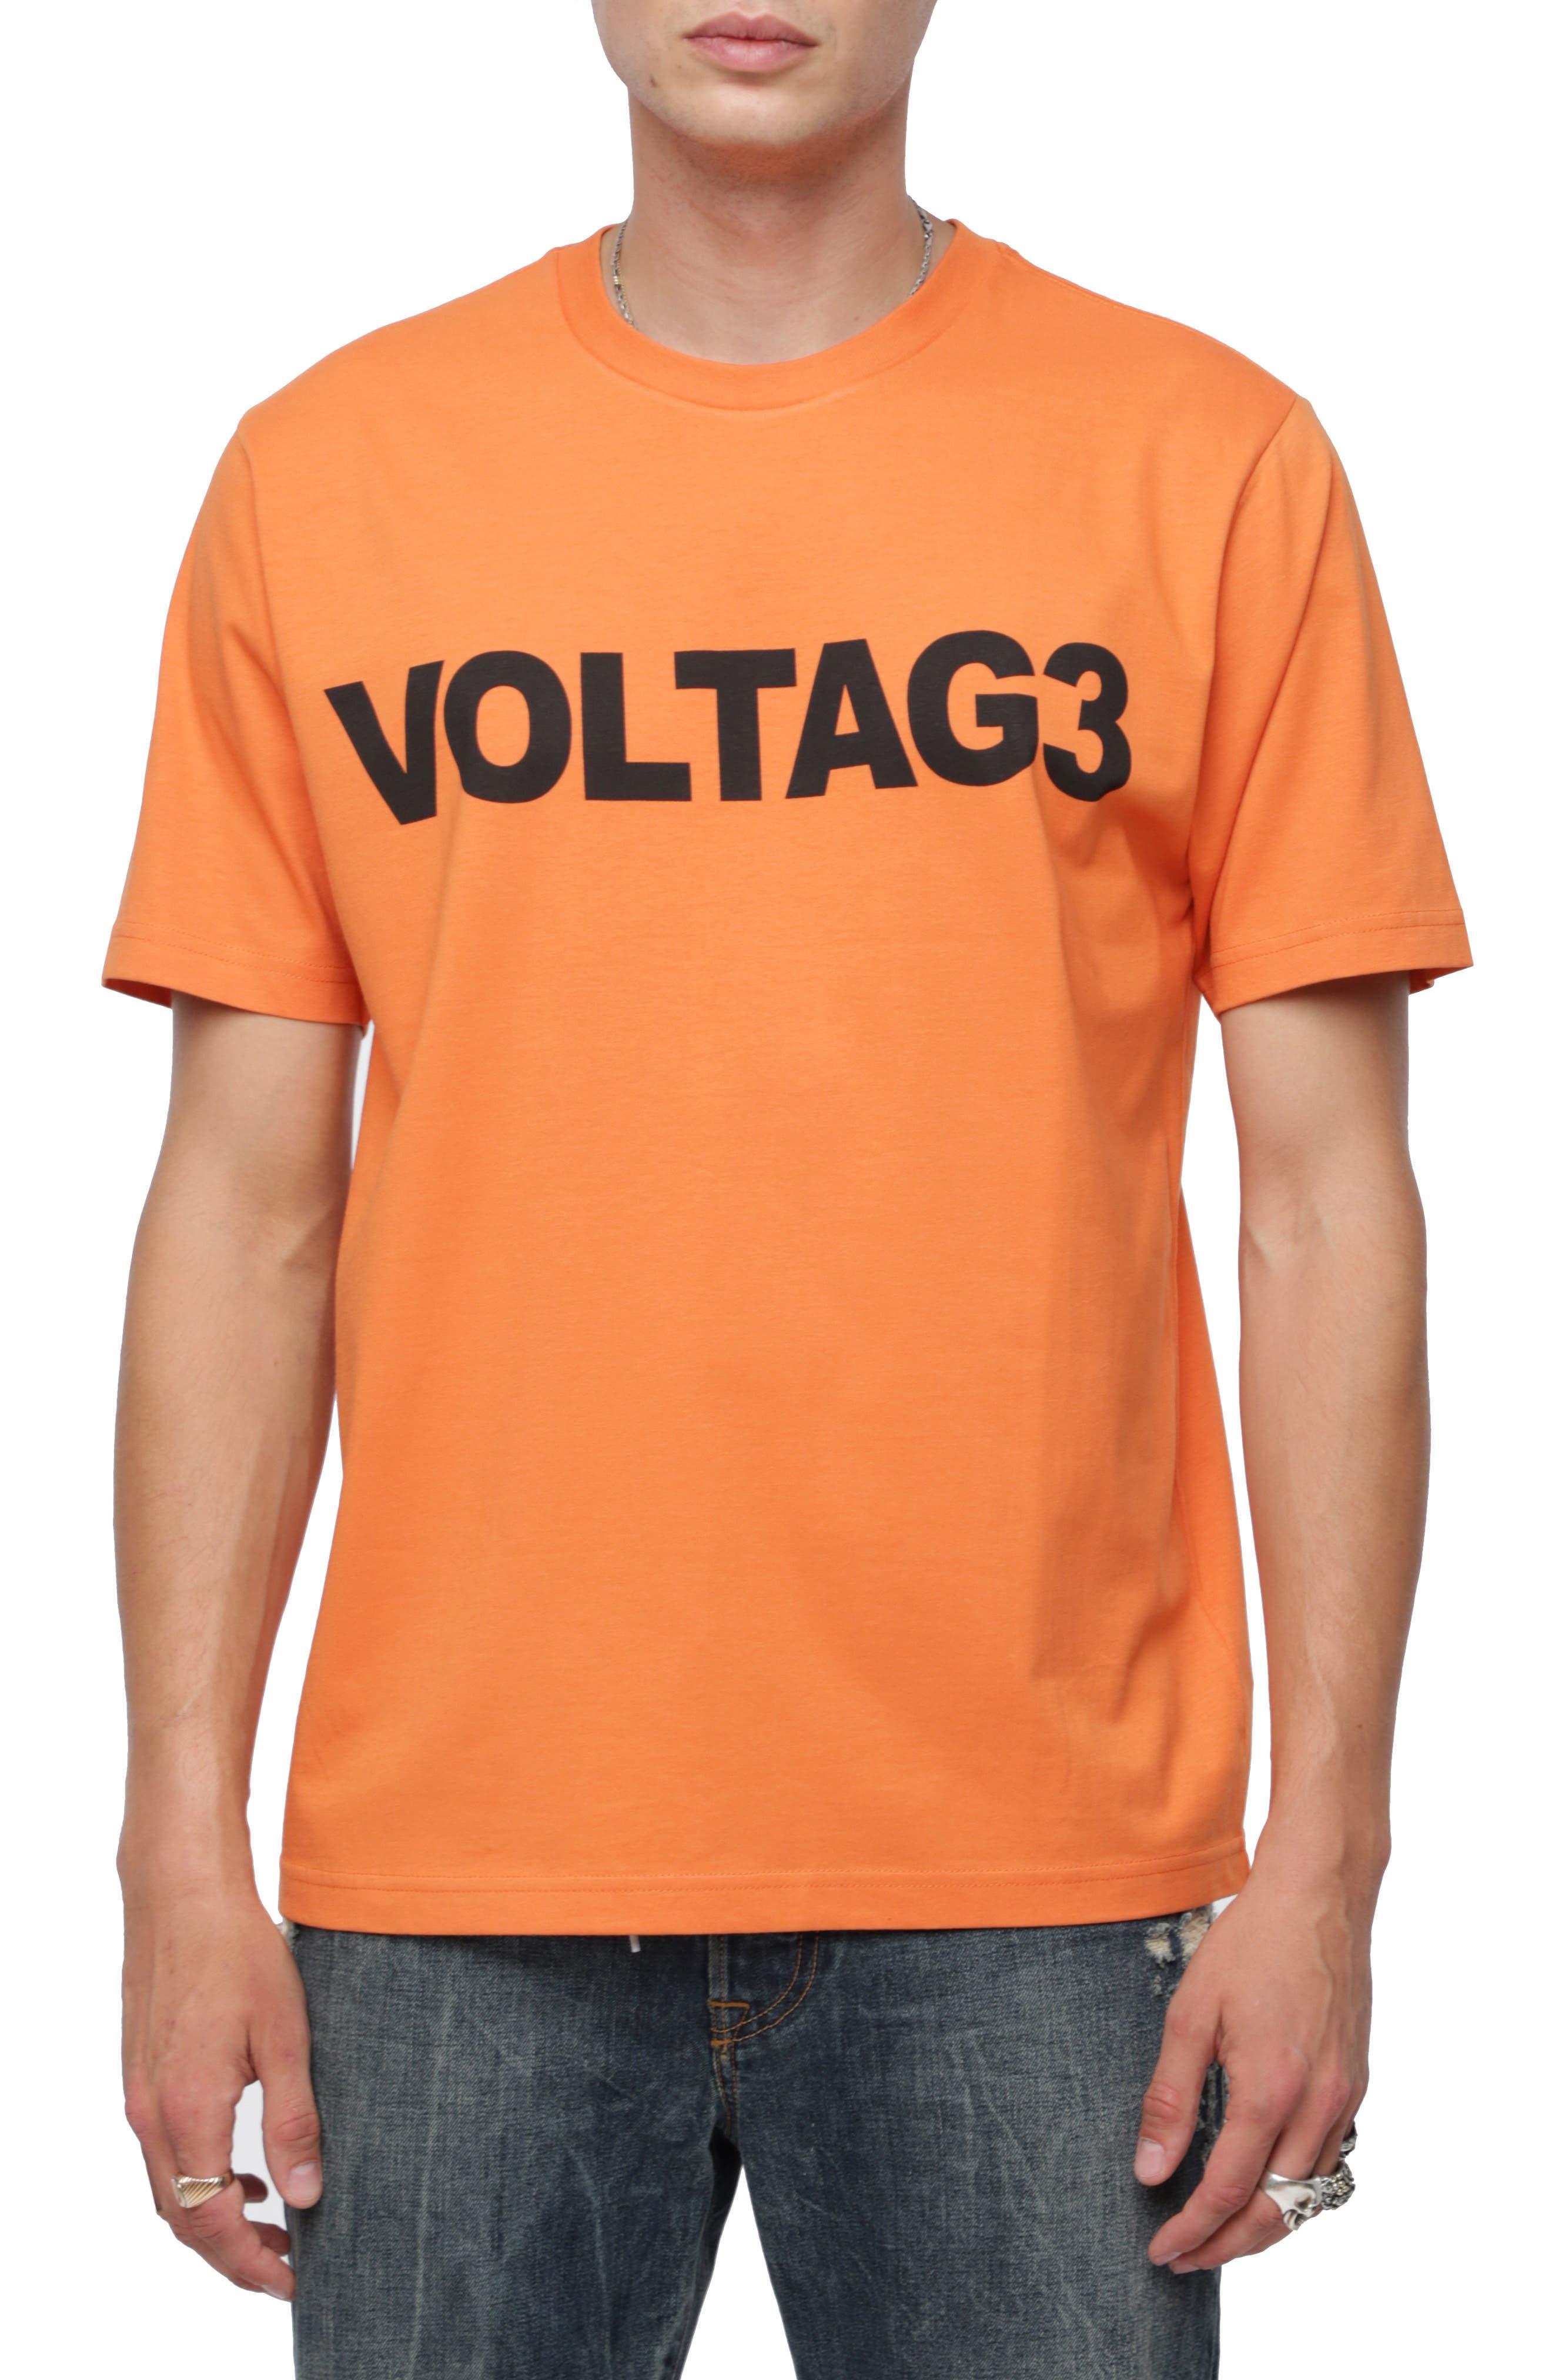 T-JUST-X1 Short Sleeve T-shirt,                             Main thumbnail 1, color,                             815